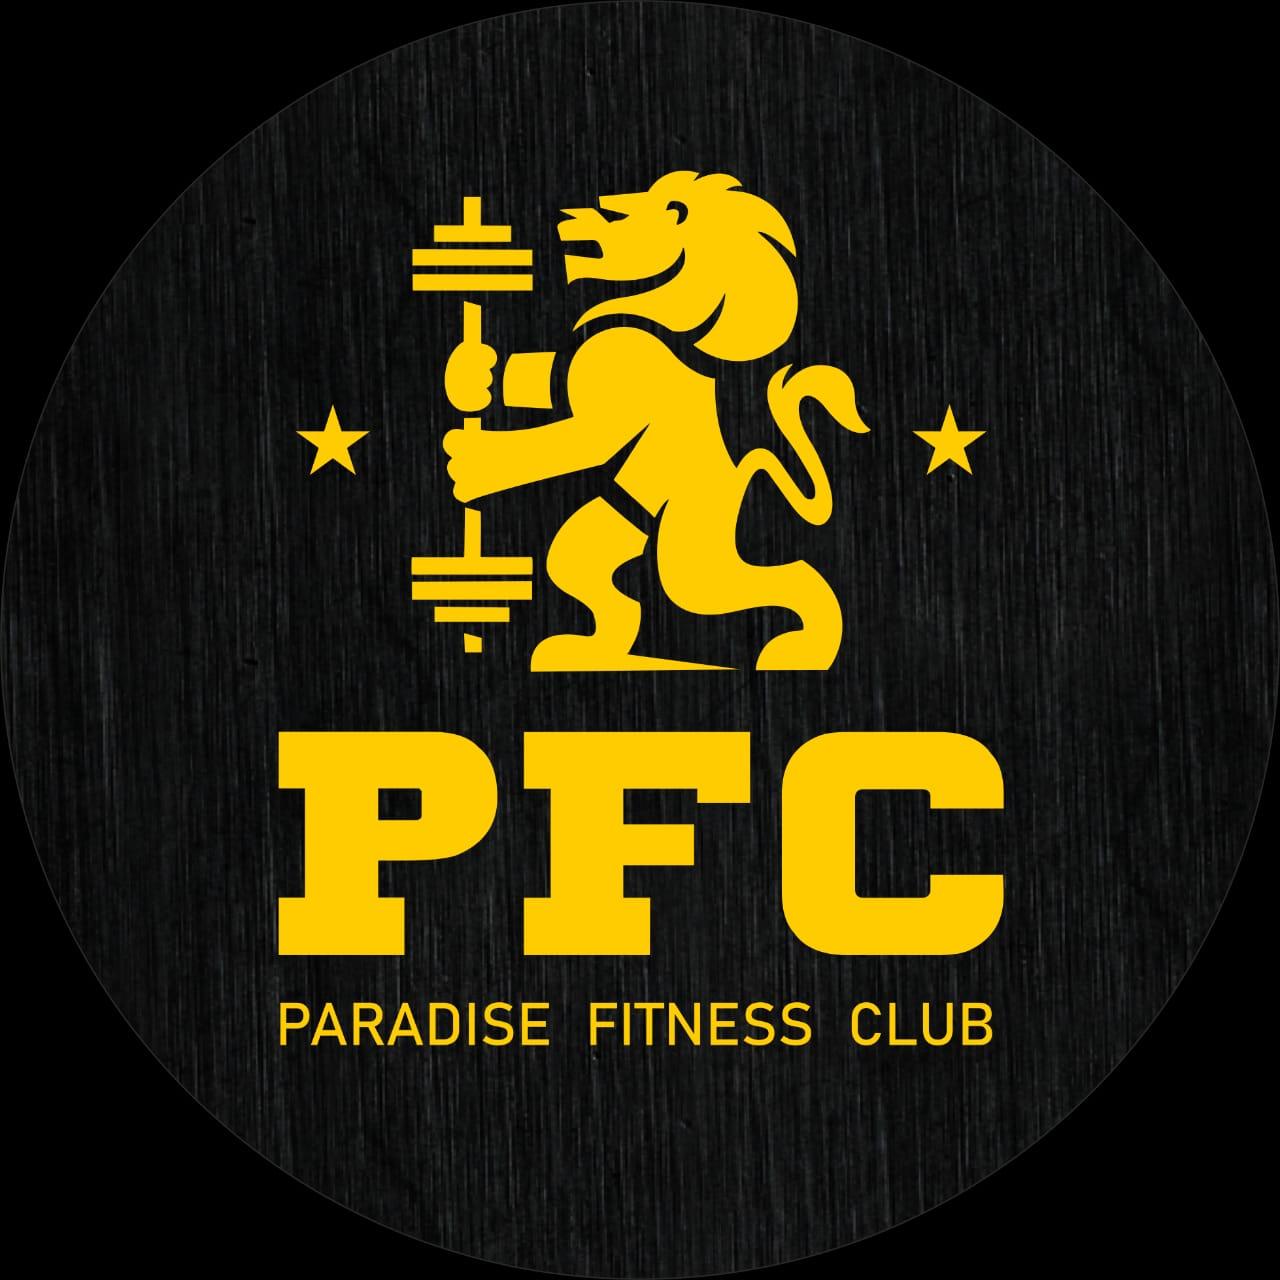 Paradise Fitness Club